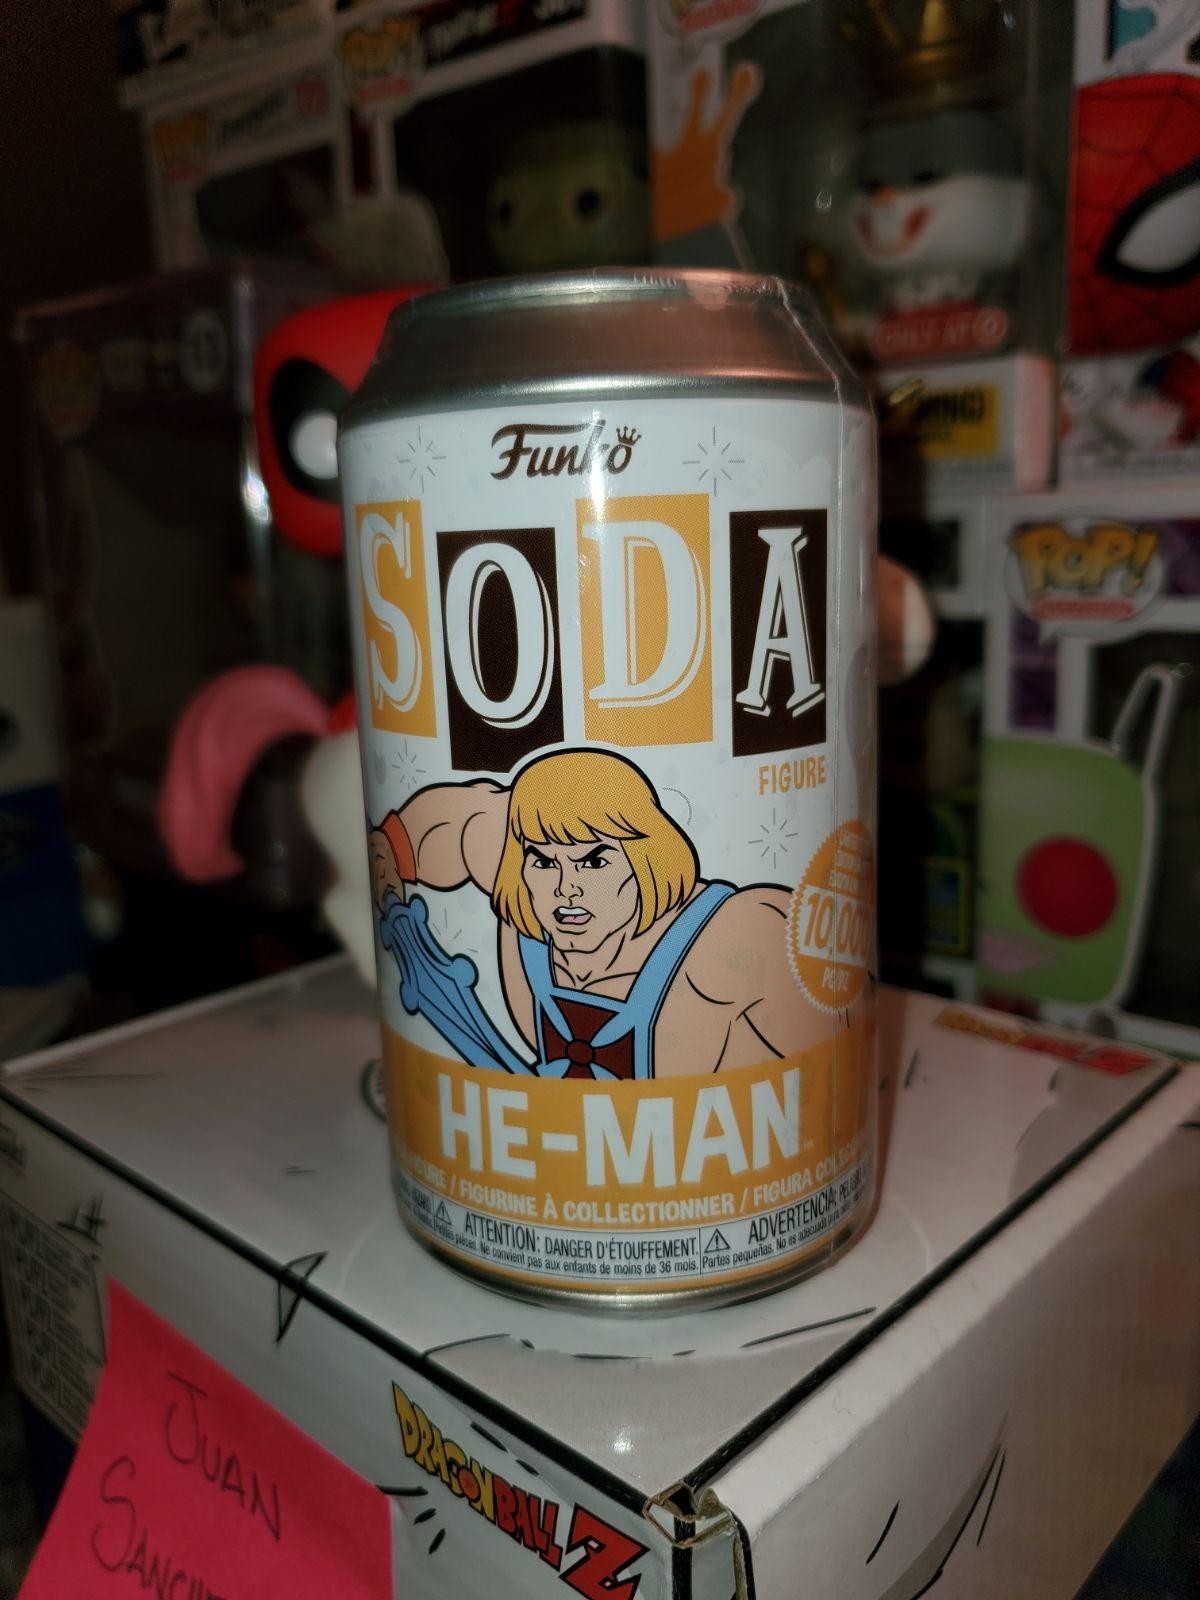 SEALED HE-MAN SODA